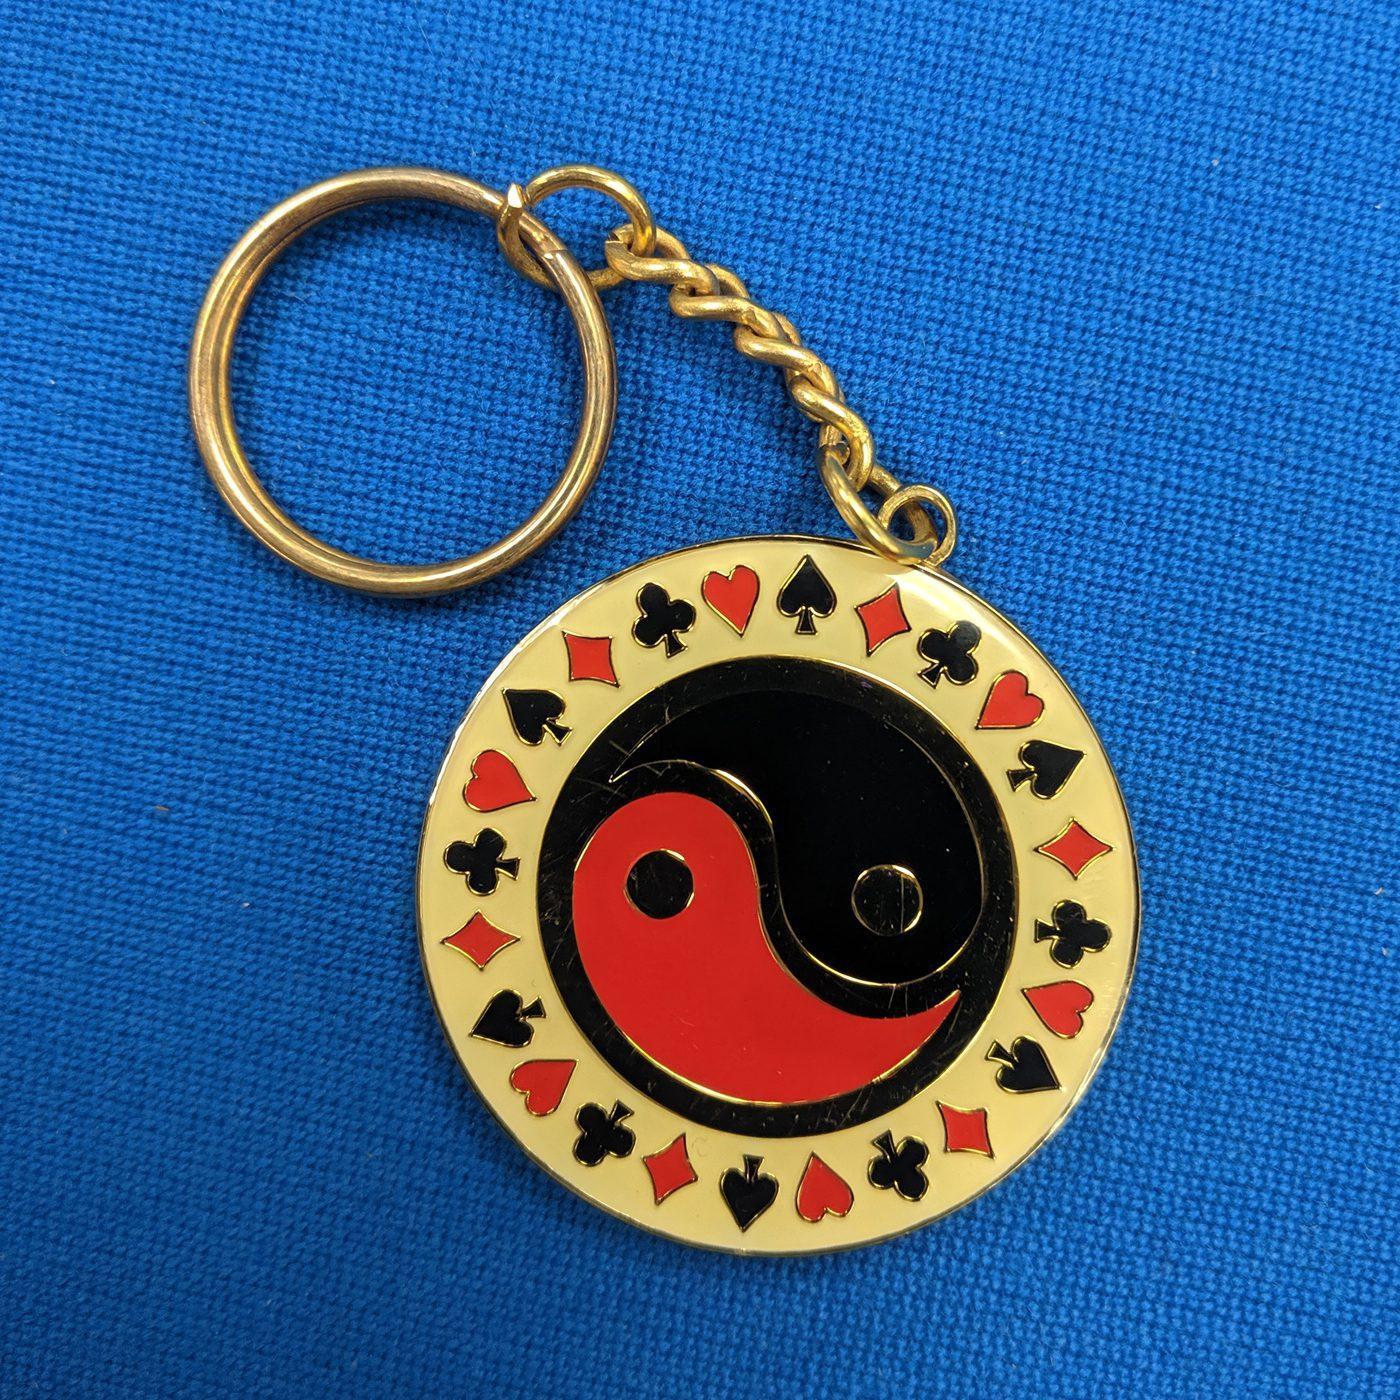 ying yang poker keychain